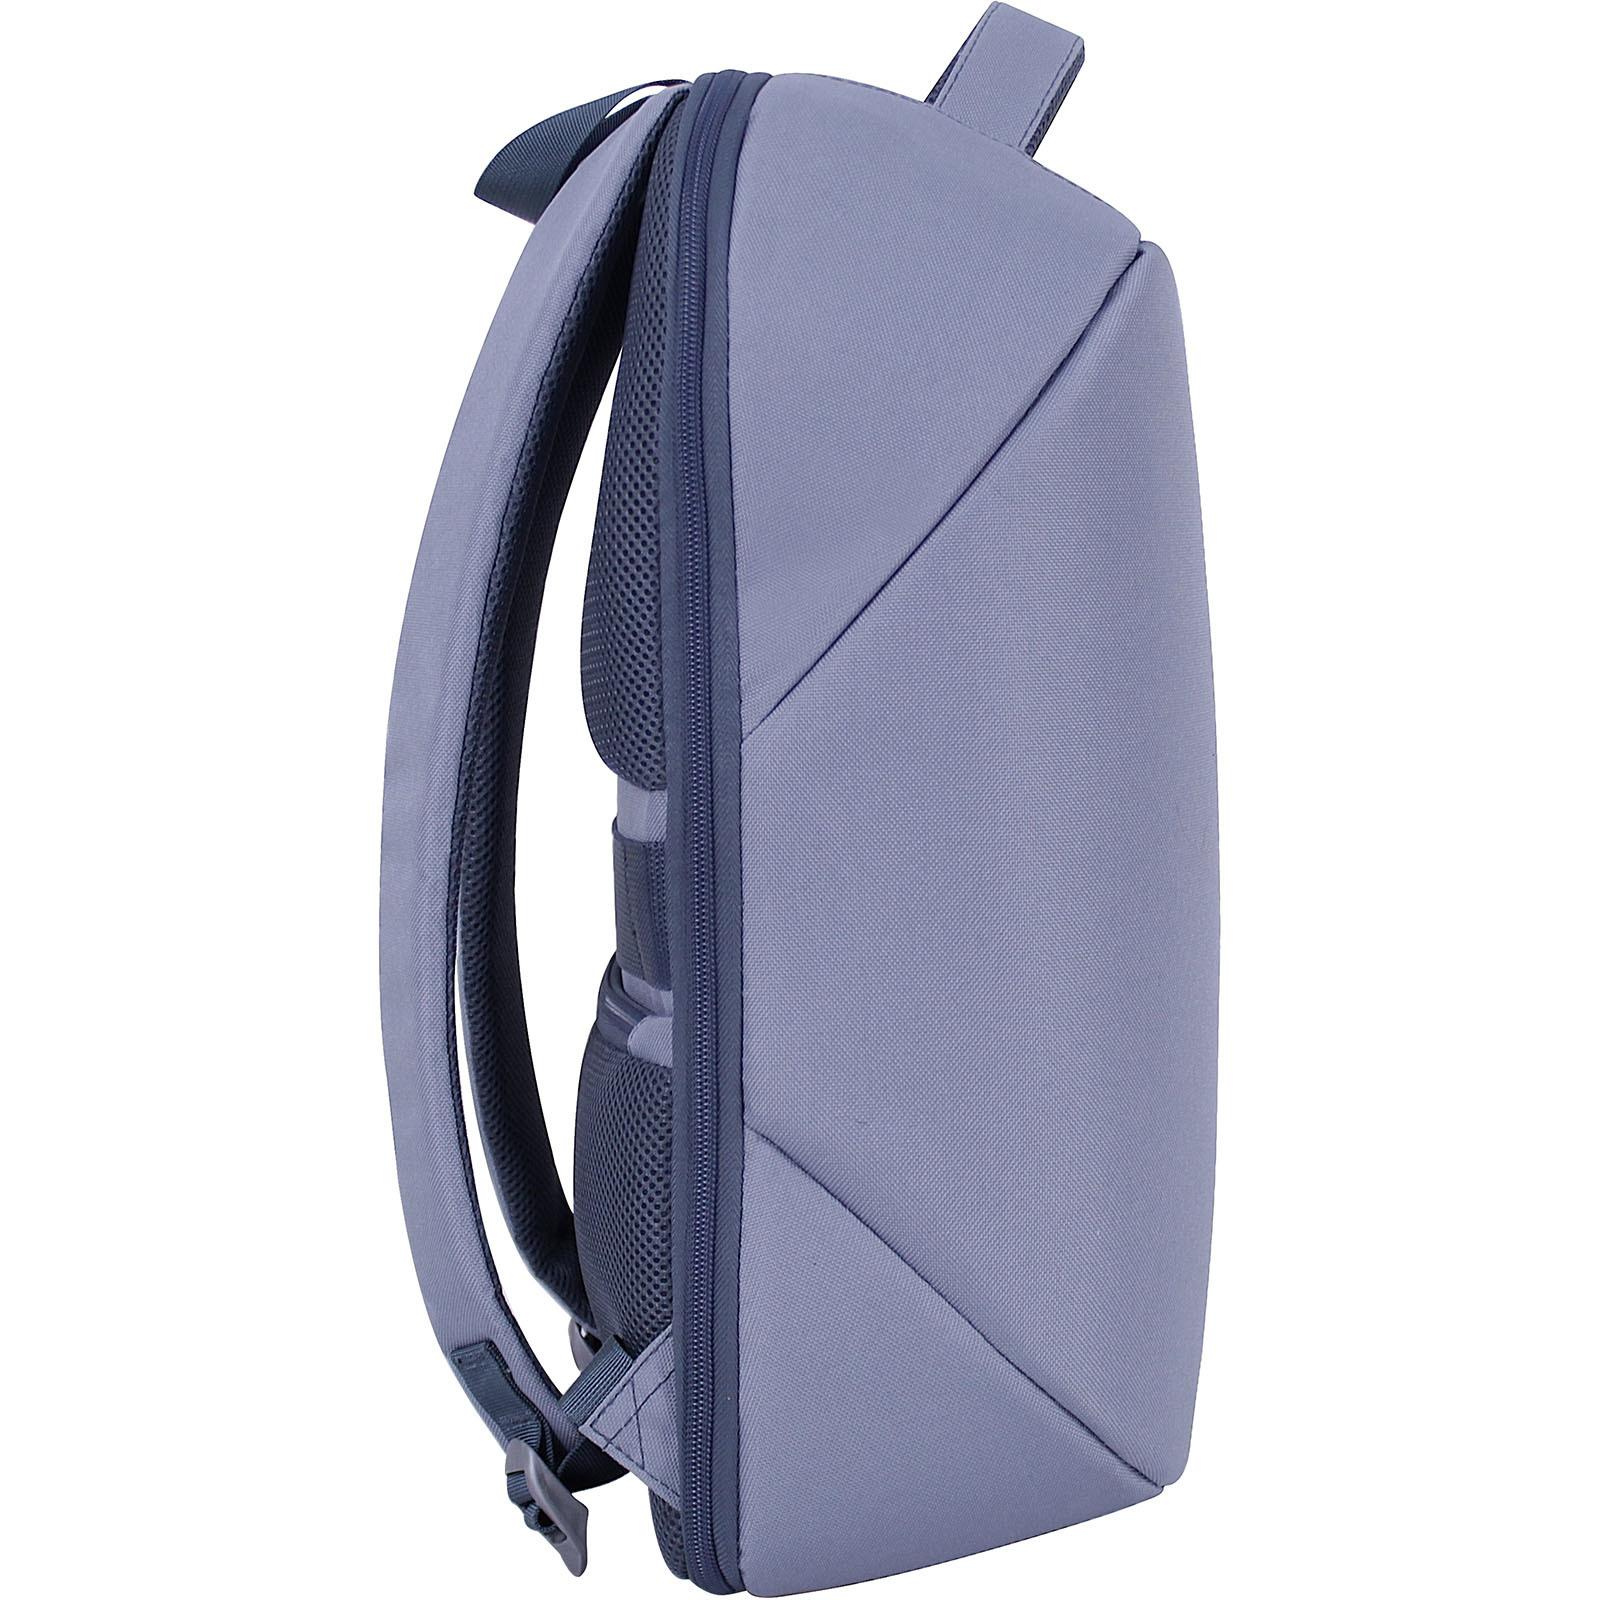 Рюкзак для ноутбука Bagland Shine 16 л. Серый (0058166) фото 2